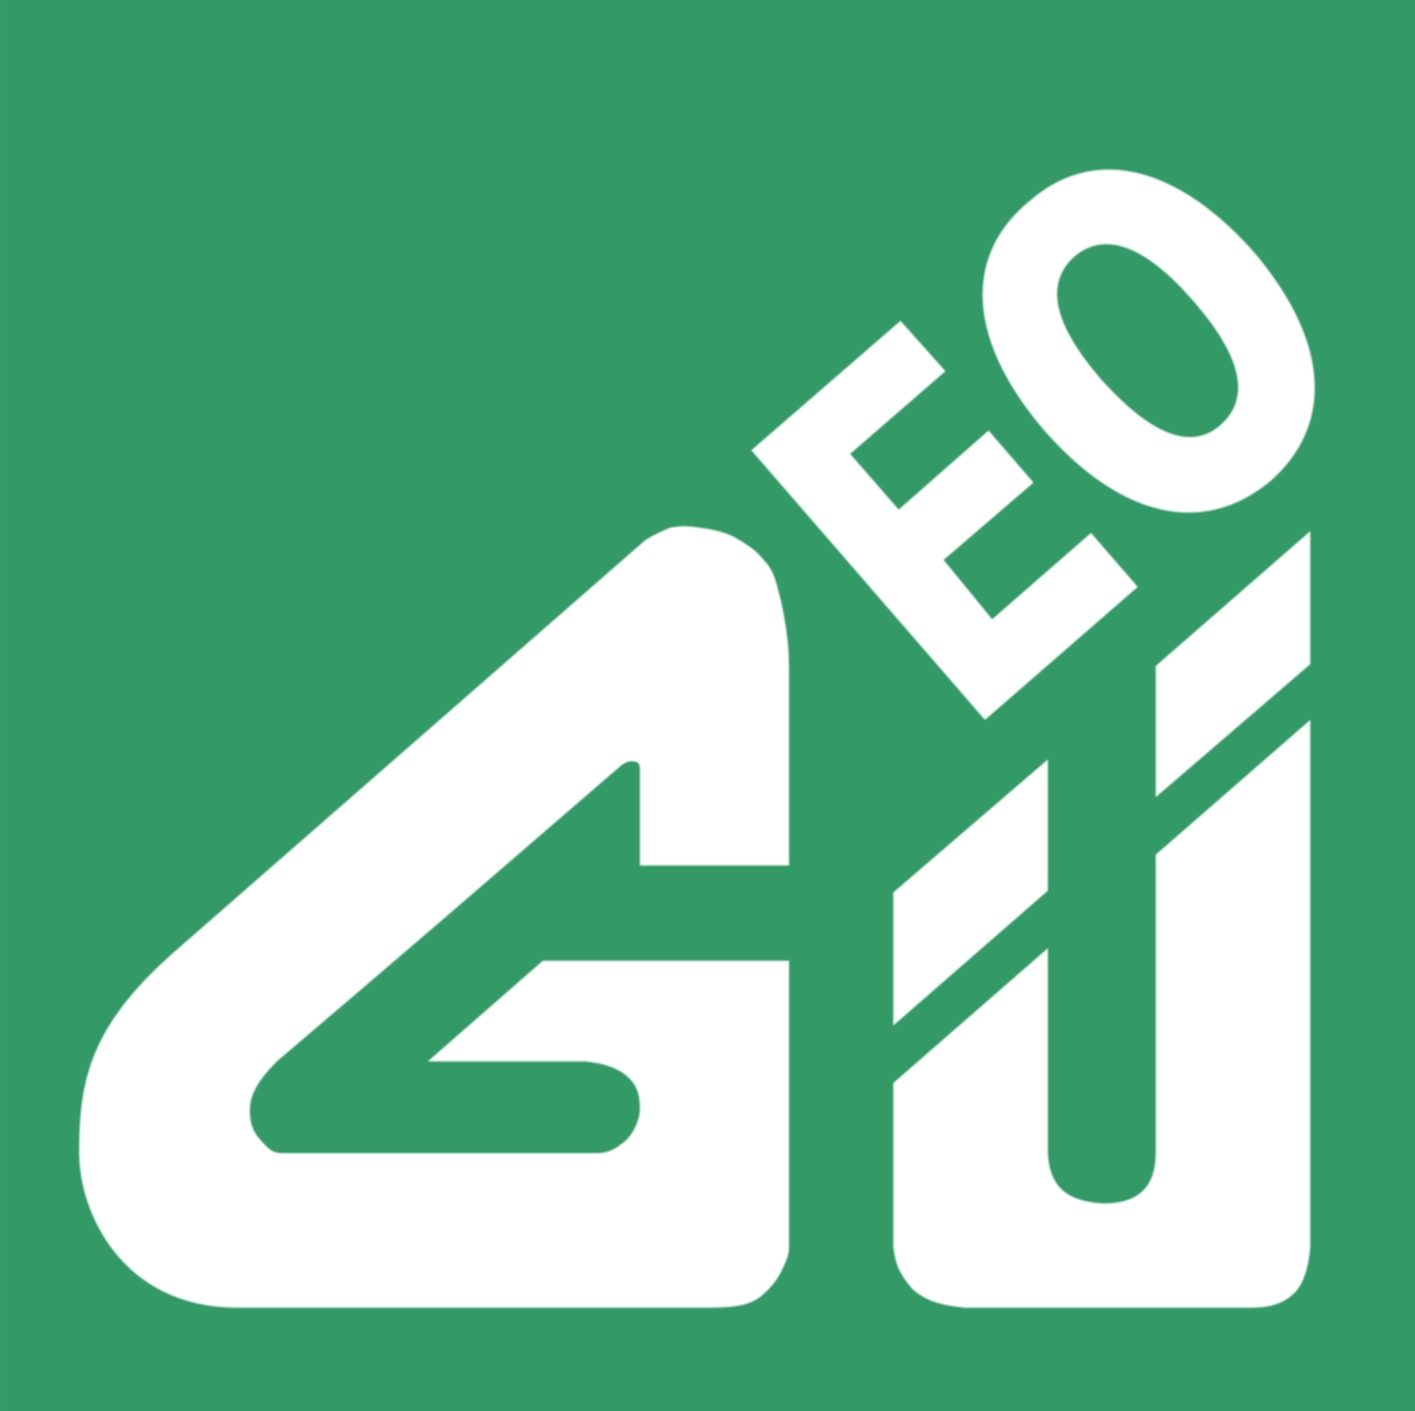 Geotechnik Gündling GmbH